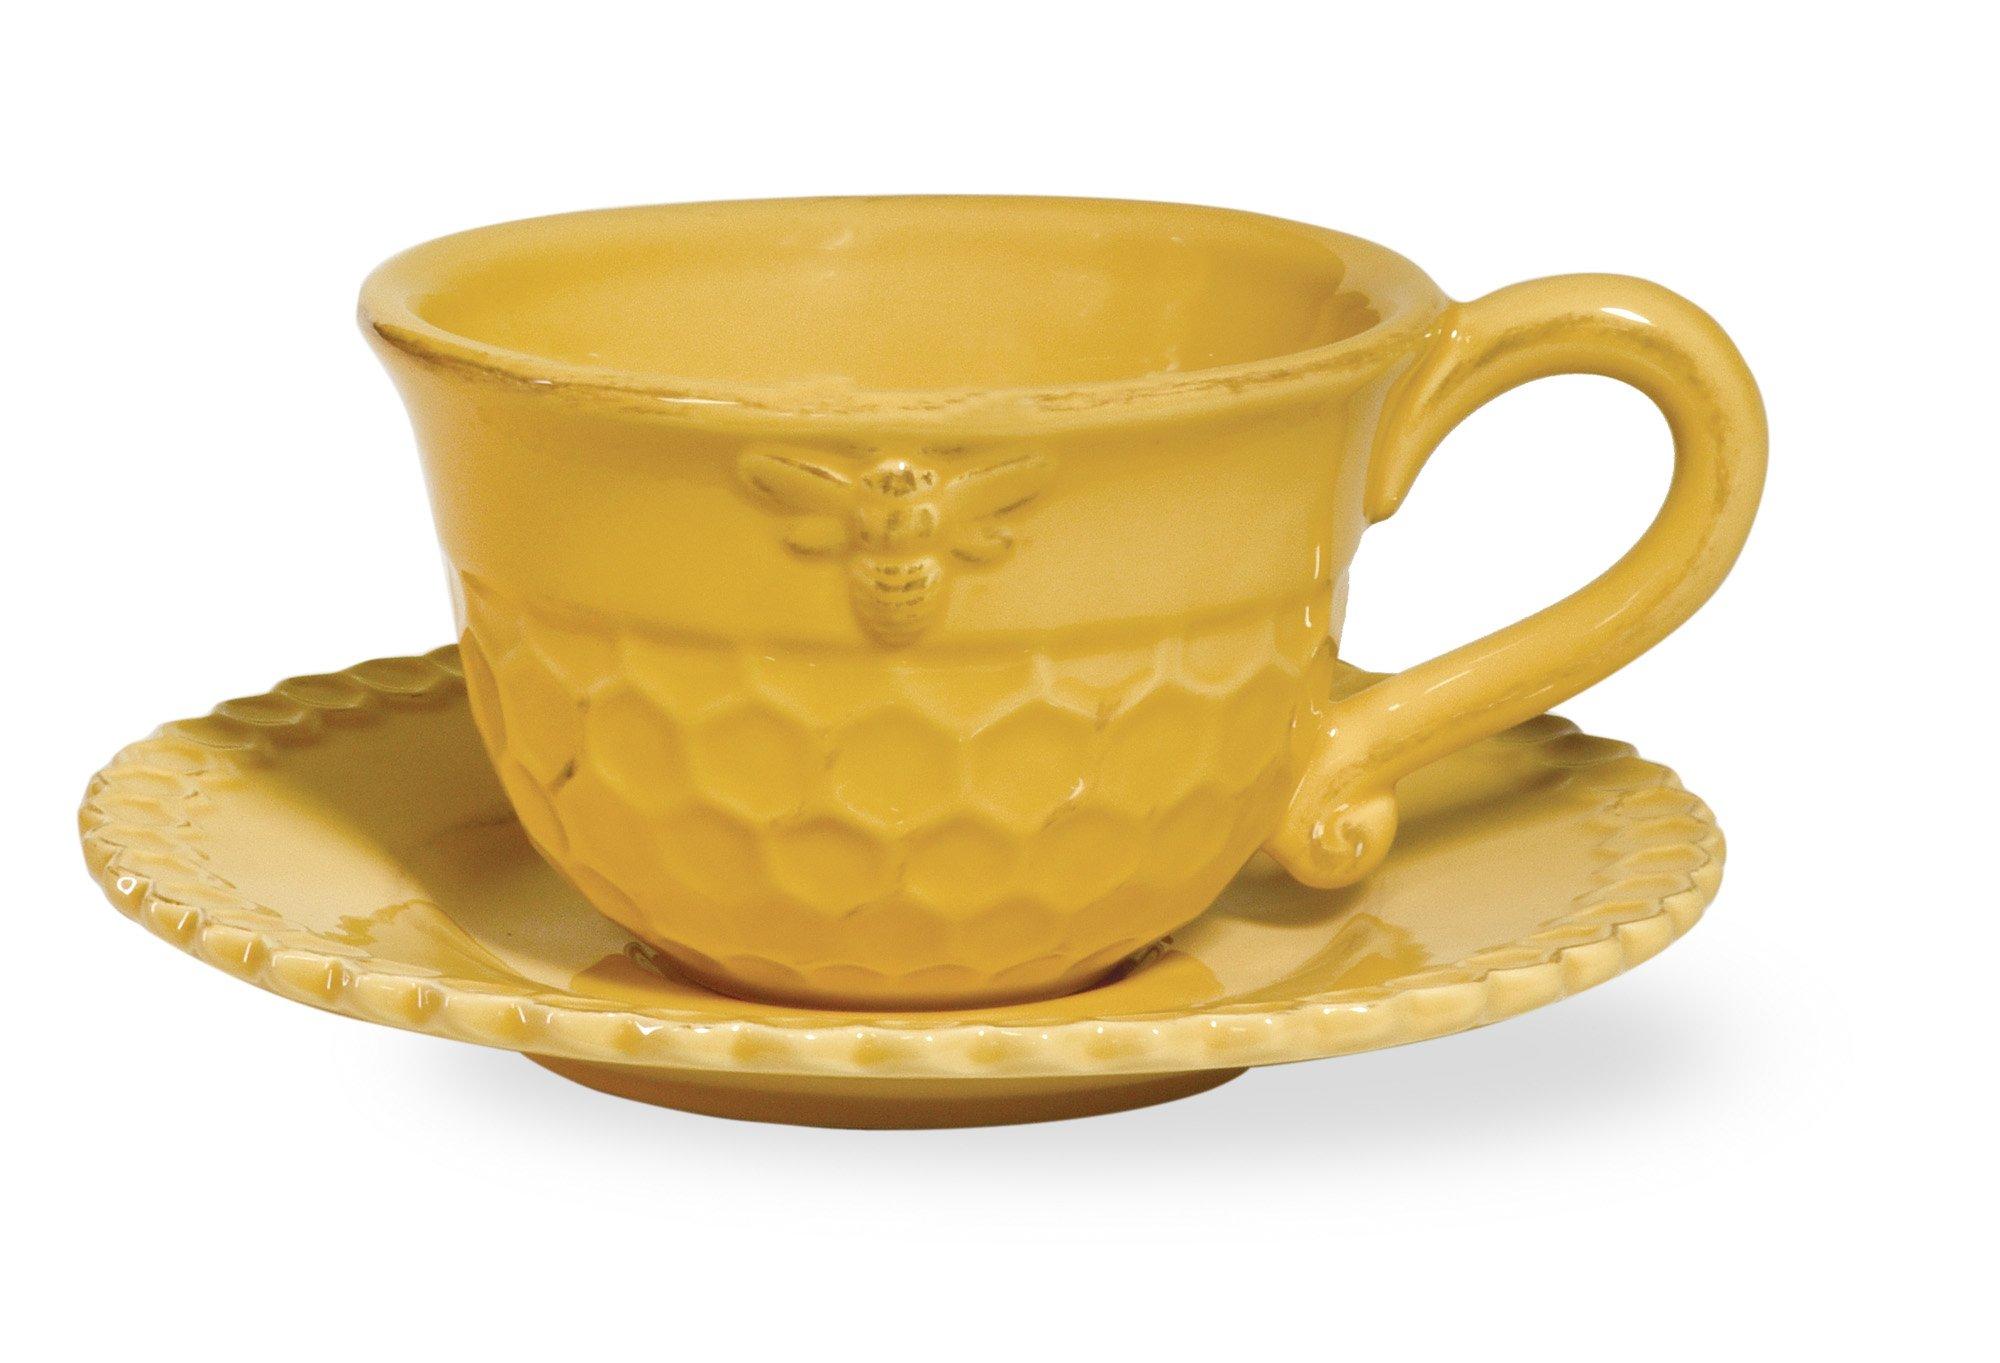 Boston International Honeycomb Ceramic Teacup and Saucer, Honey